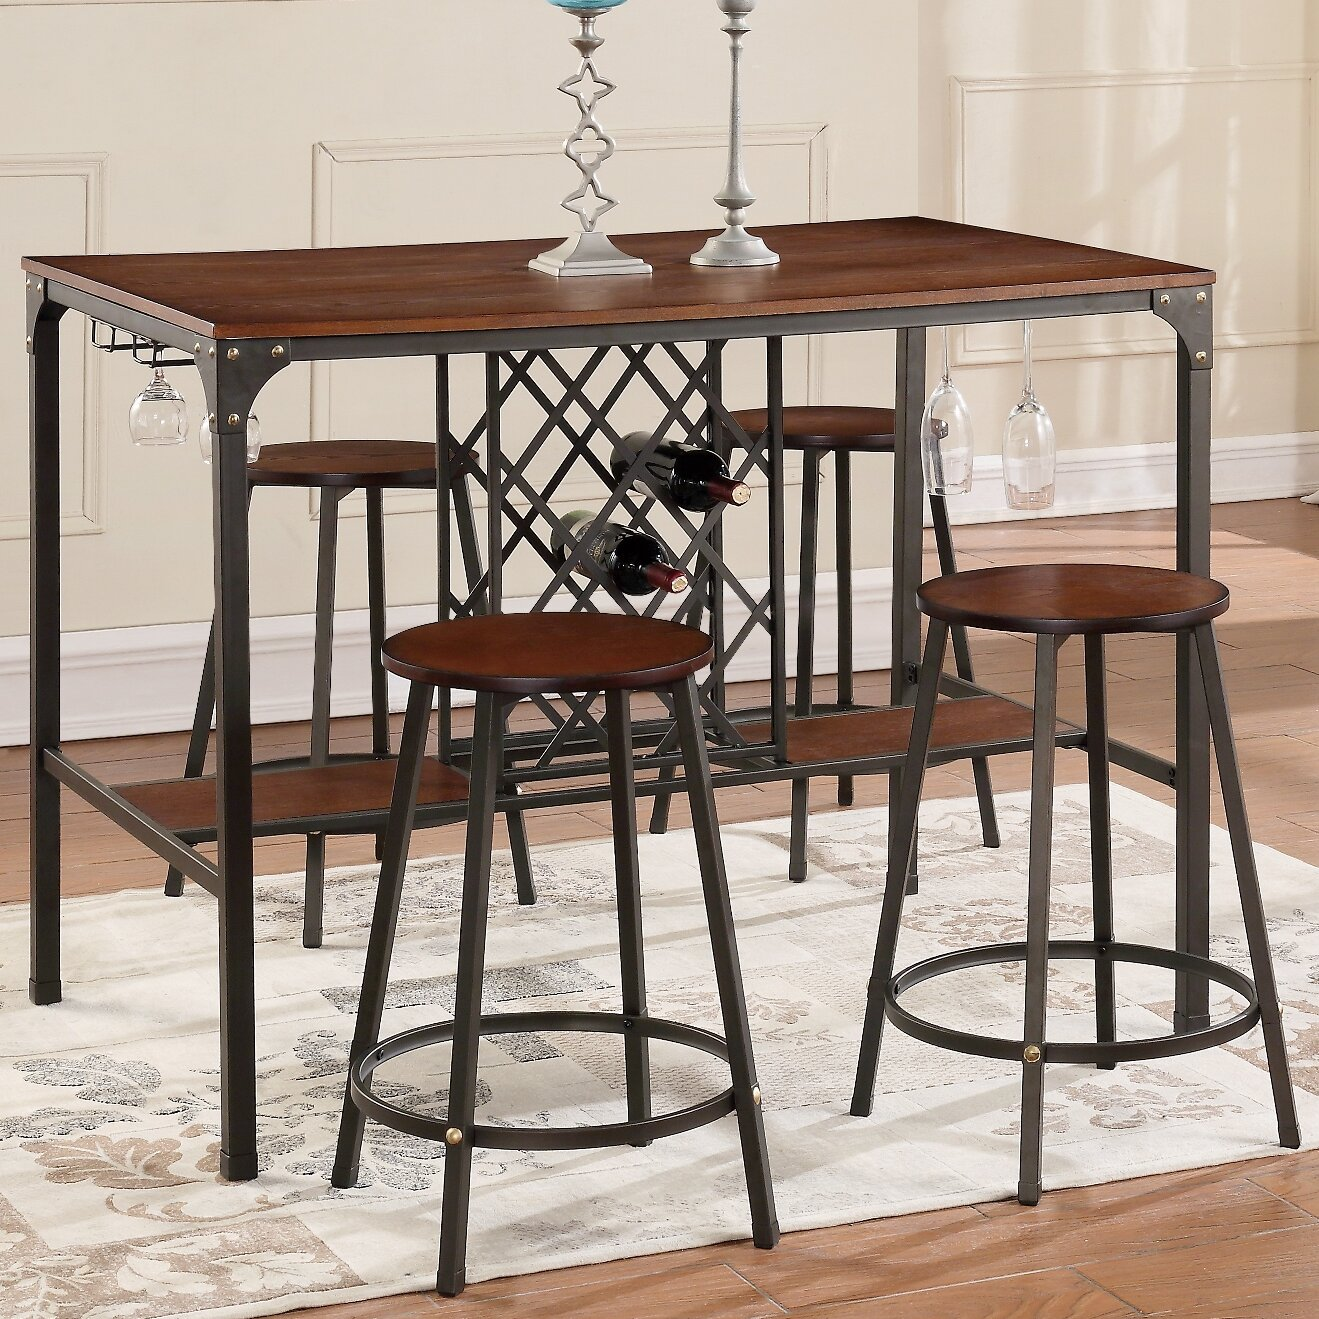 littell 5 piece pub table set reviews allmodern. Black Bedroom Furniture Sets. Home Design Ideas